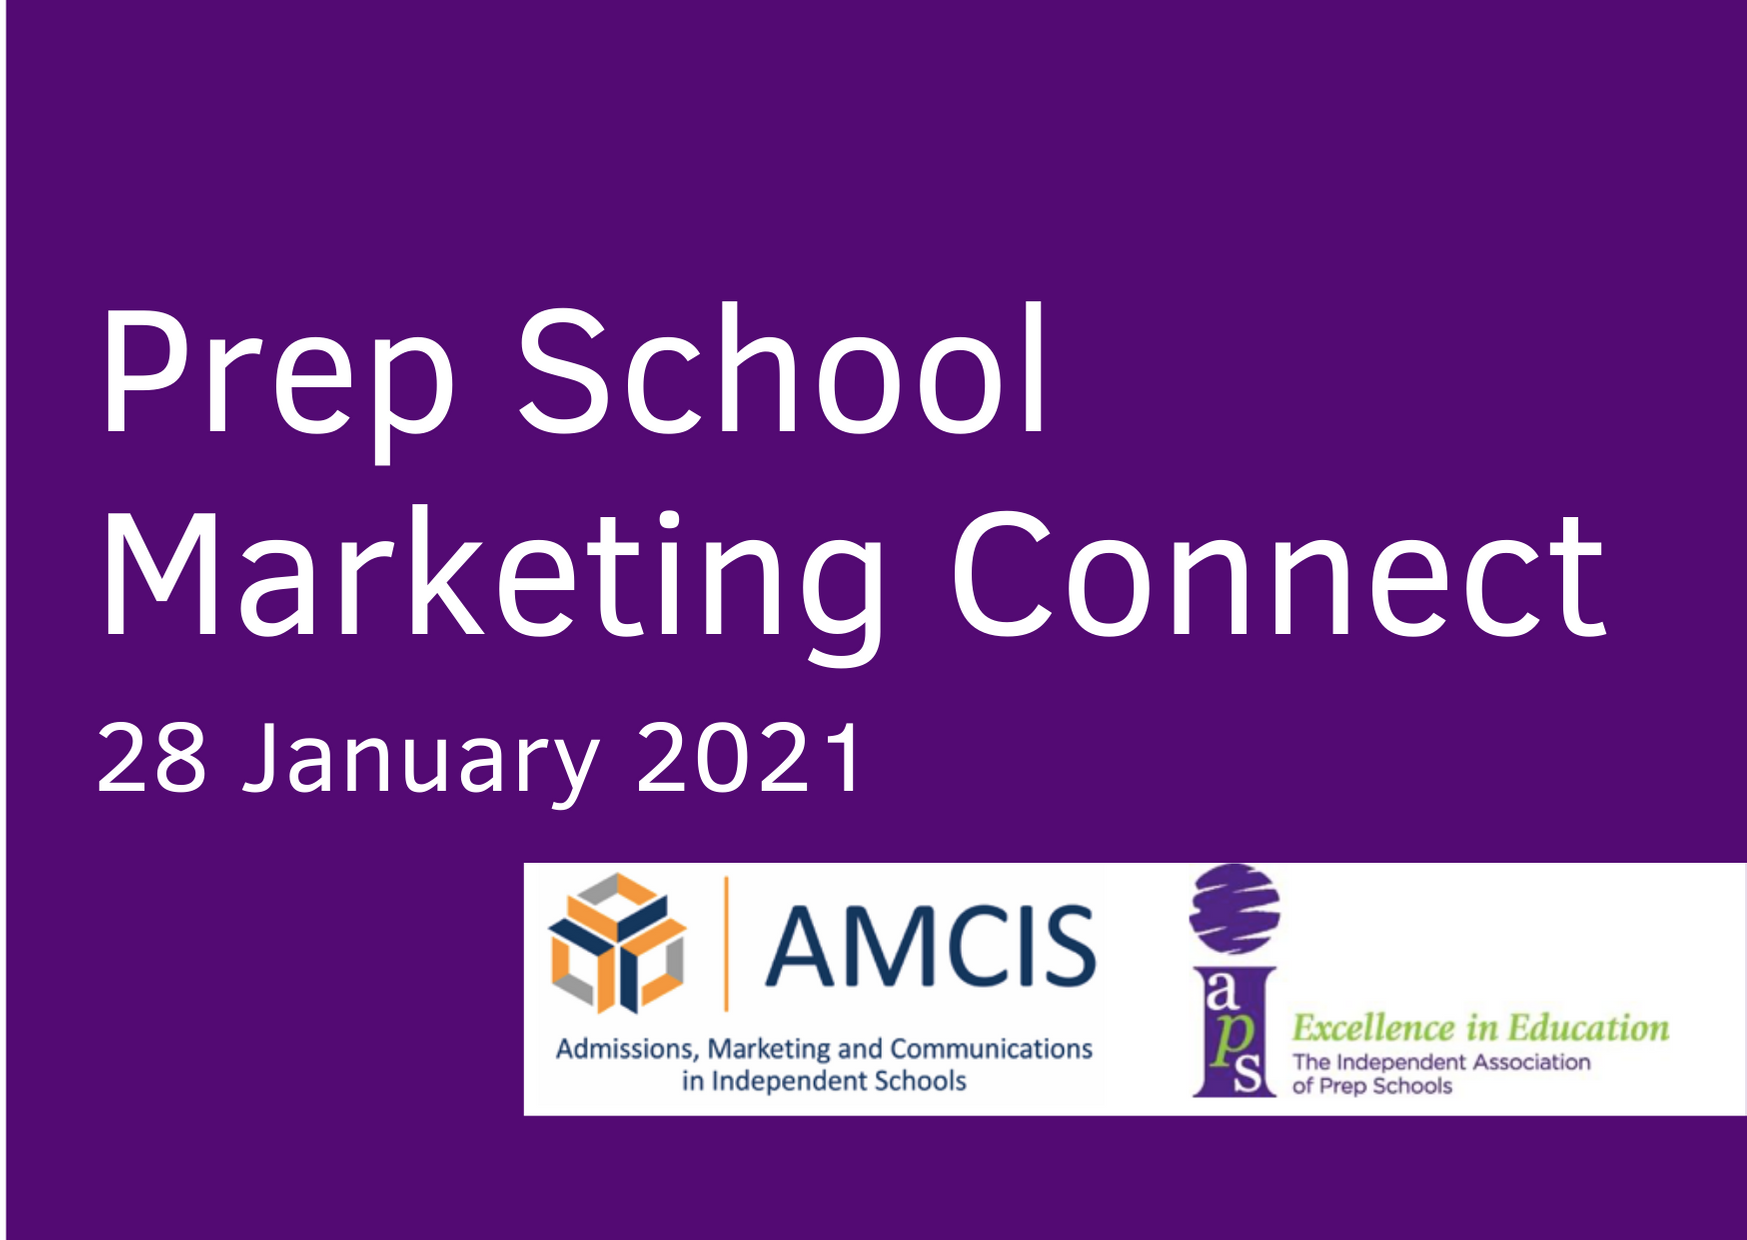 Prep School Marketing Connect